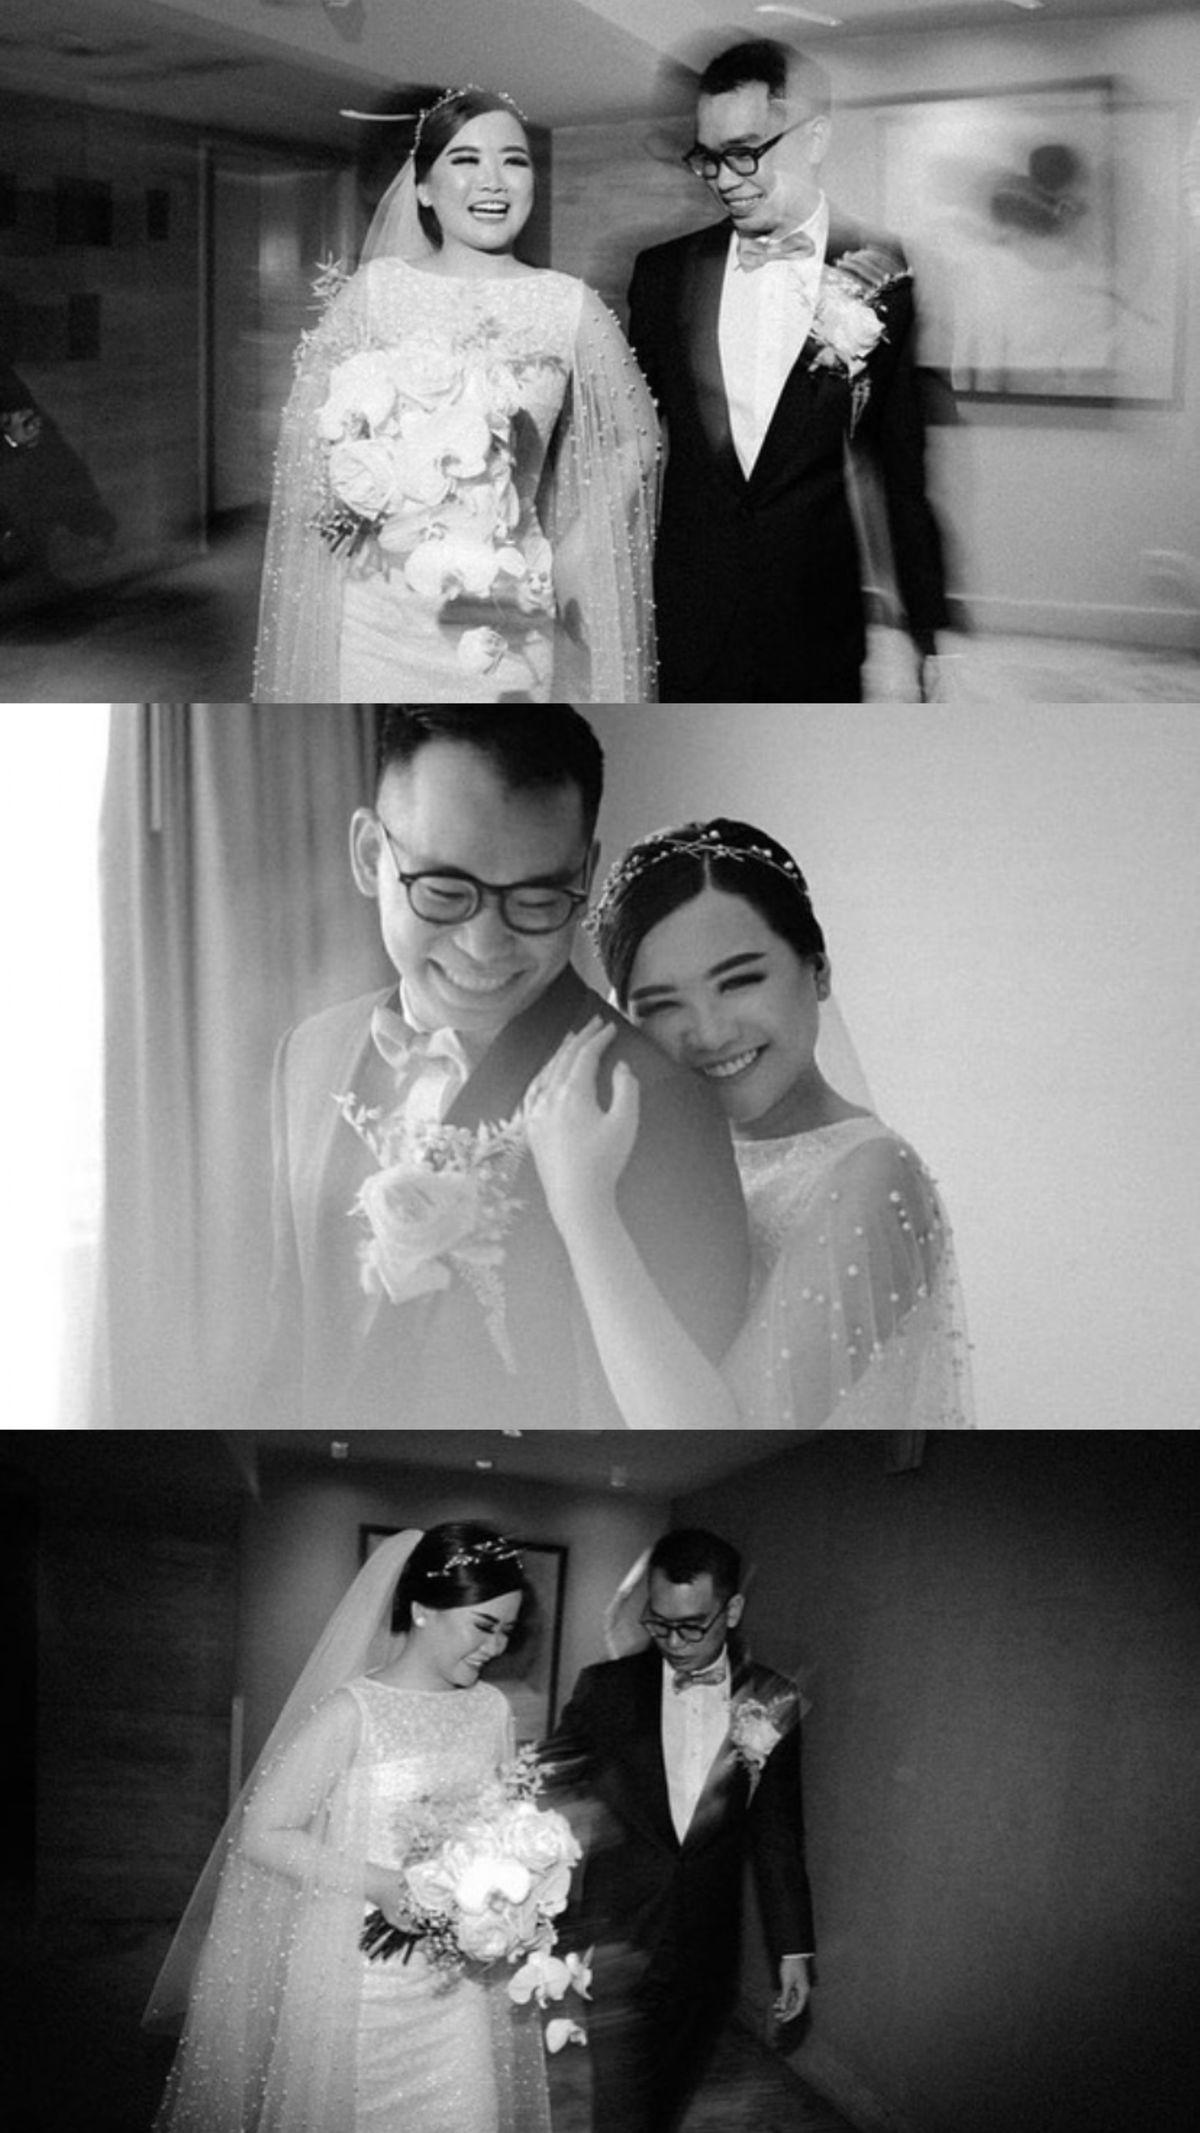 The Wedding of Gide+Jeal